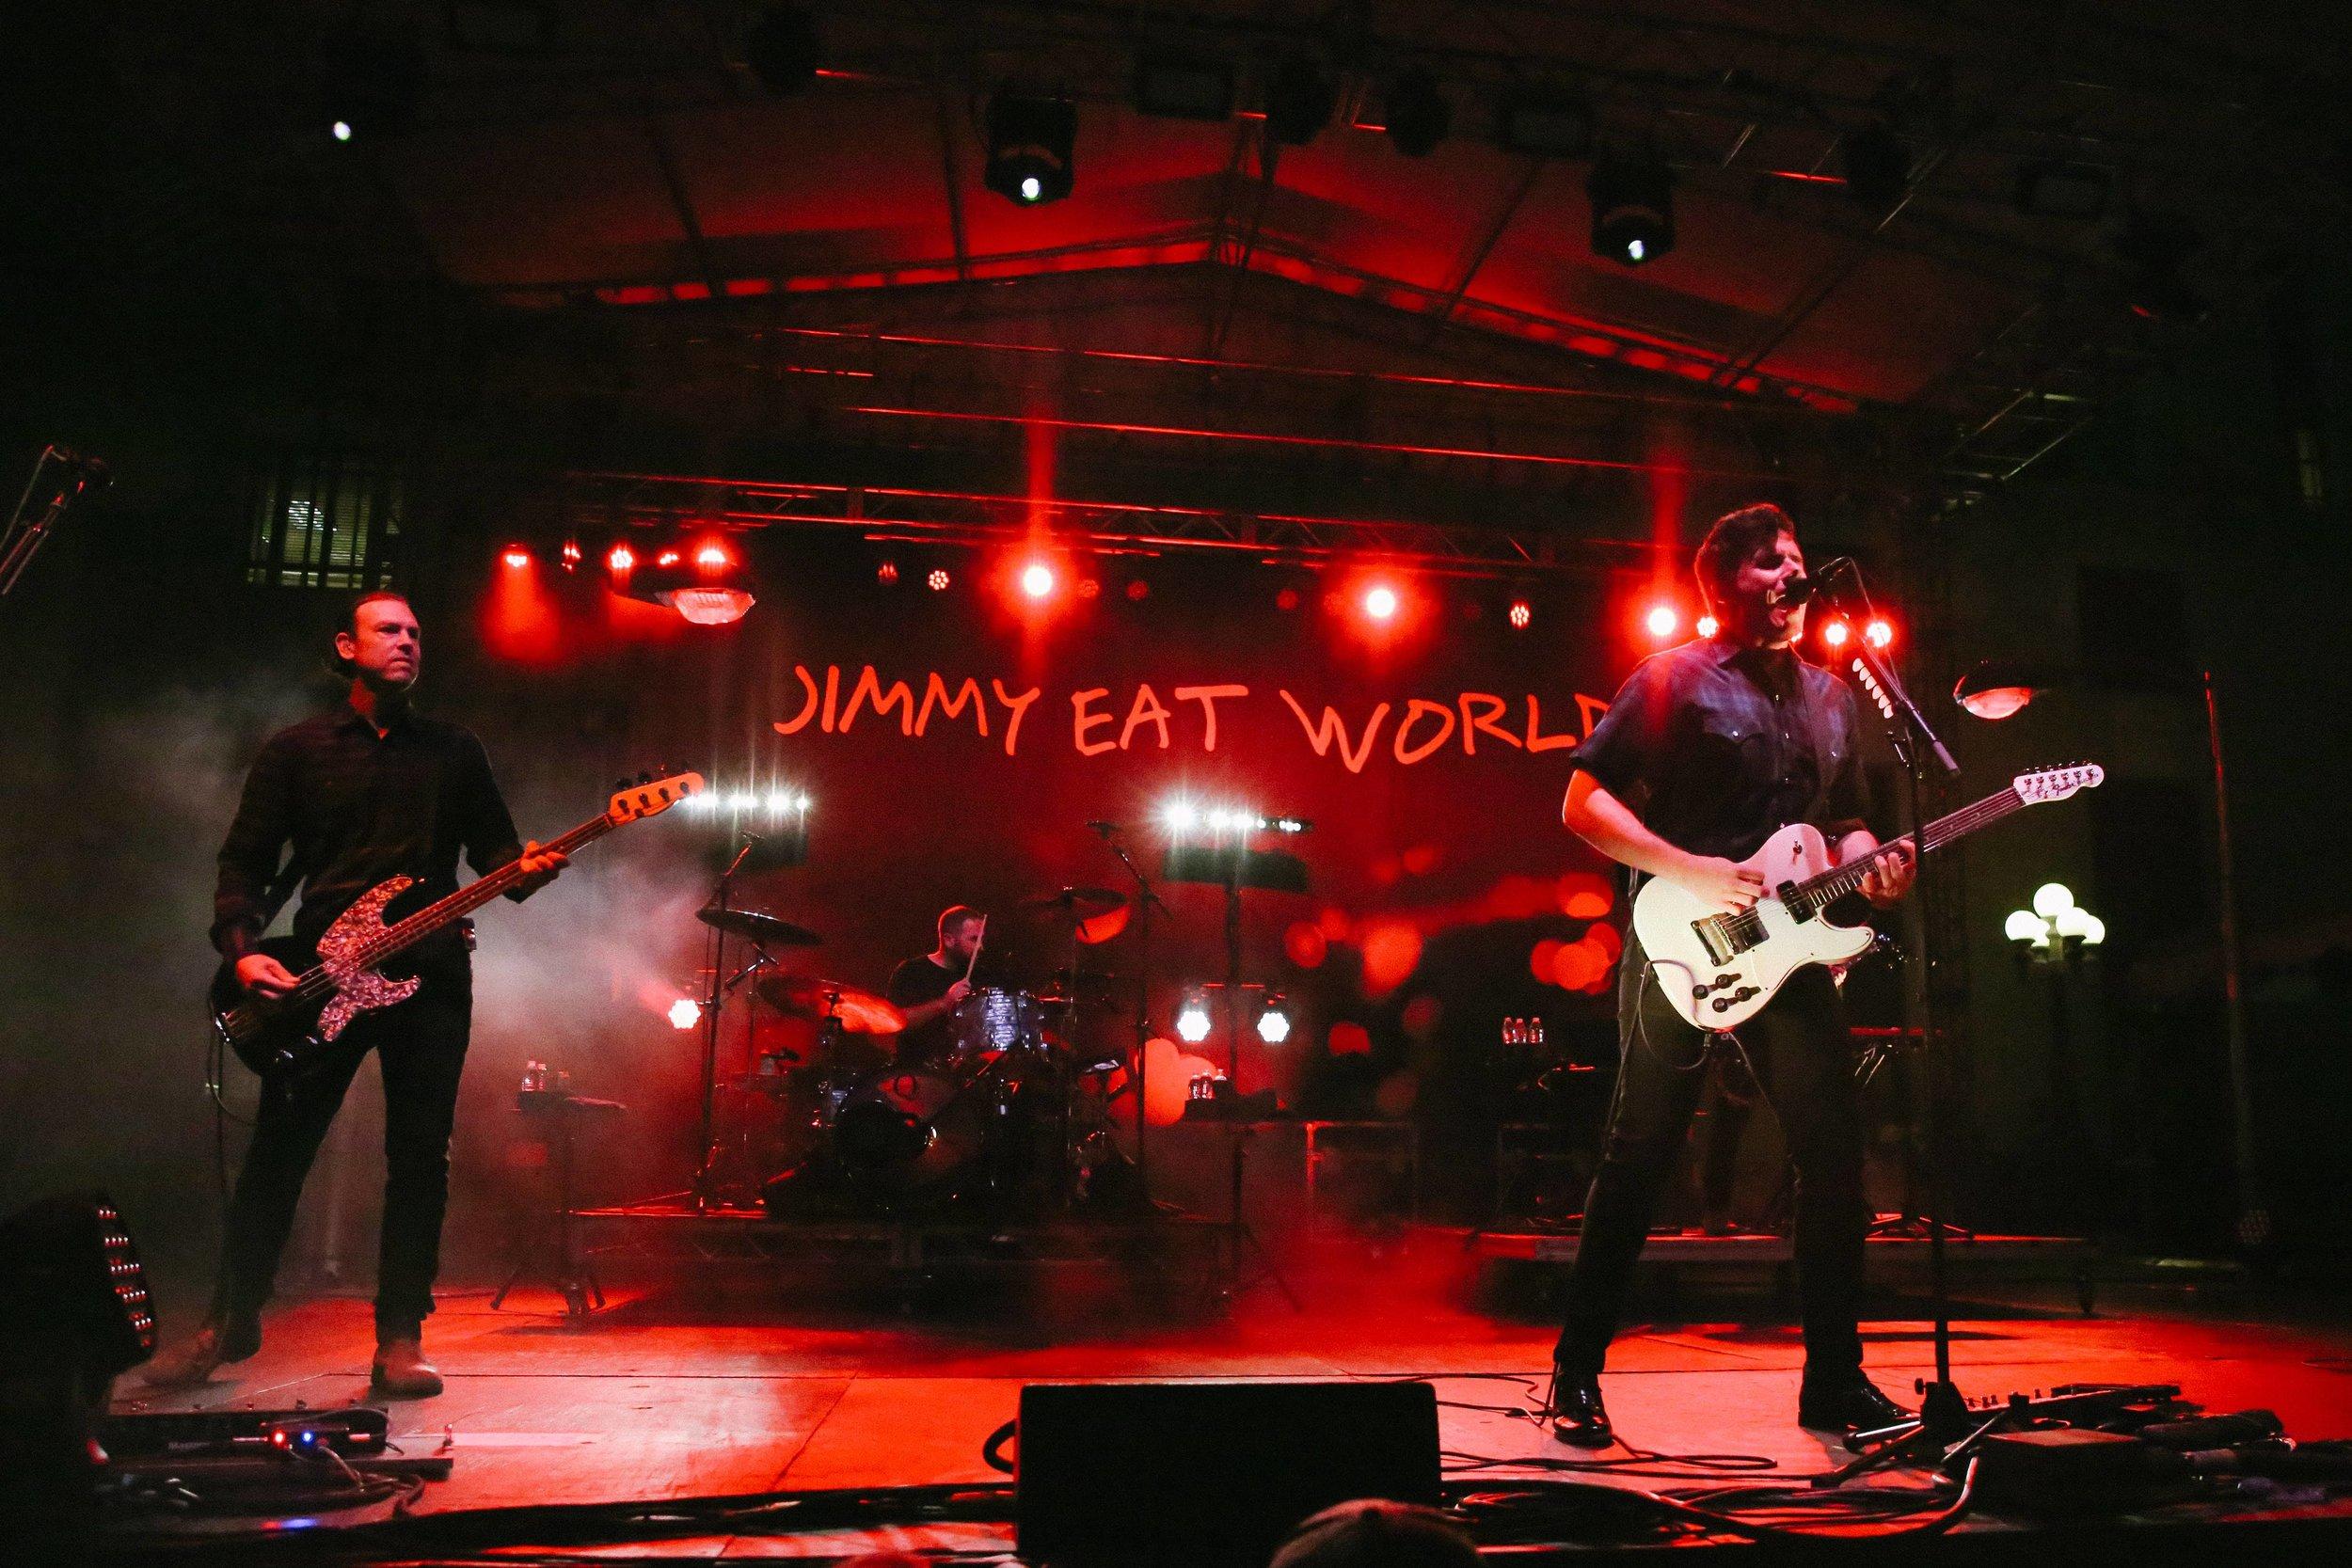 JimmyEatWorld_LOTG_TN2018-5.jpg